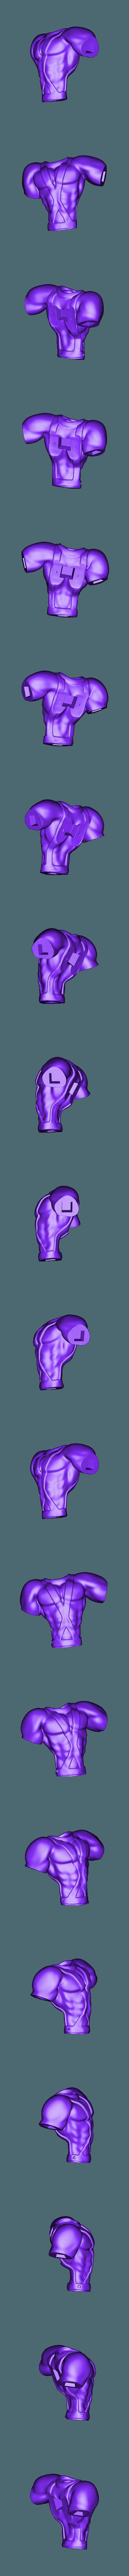 Cuerpo PR2.OBJ Download free OBJ file Earthworm Jim • 3D printable template, taiced3d